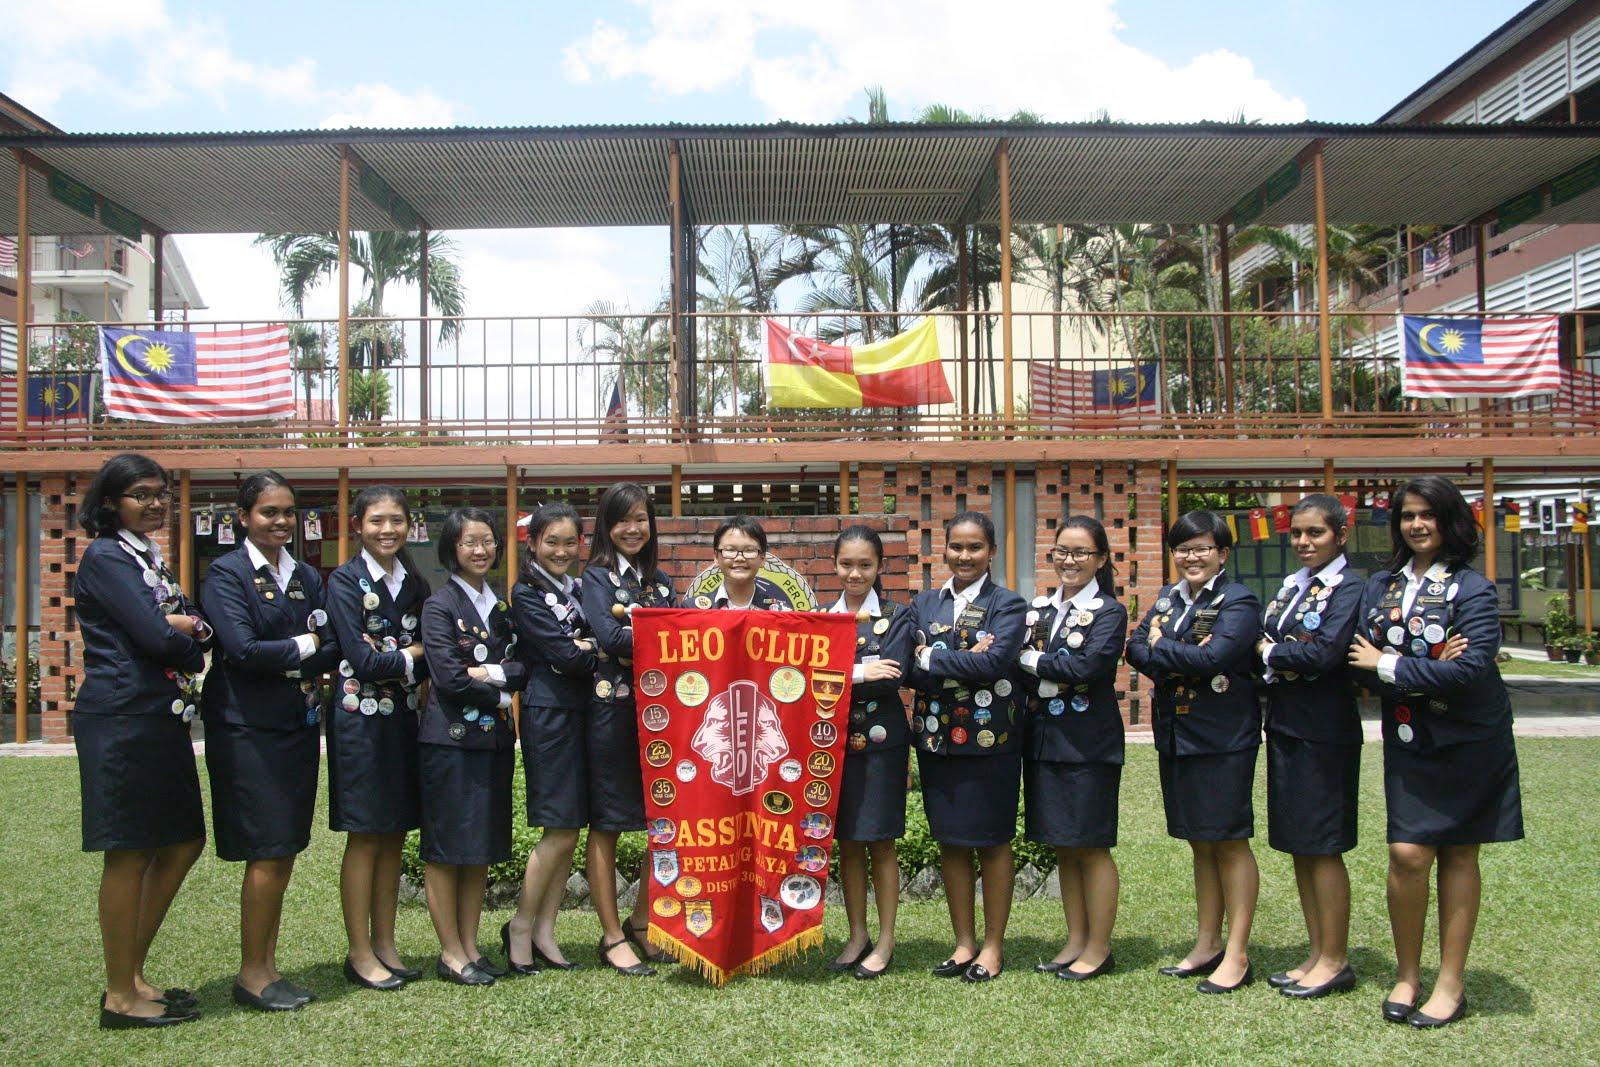 Leo Club of Assunta Secondary School